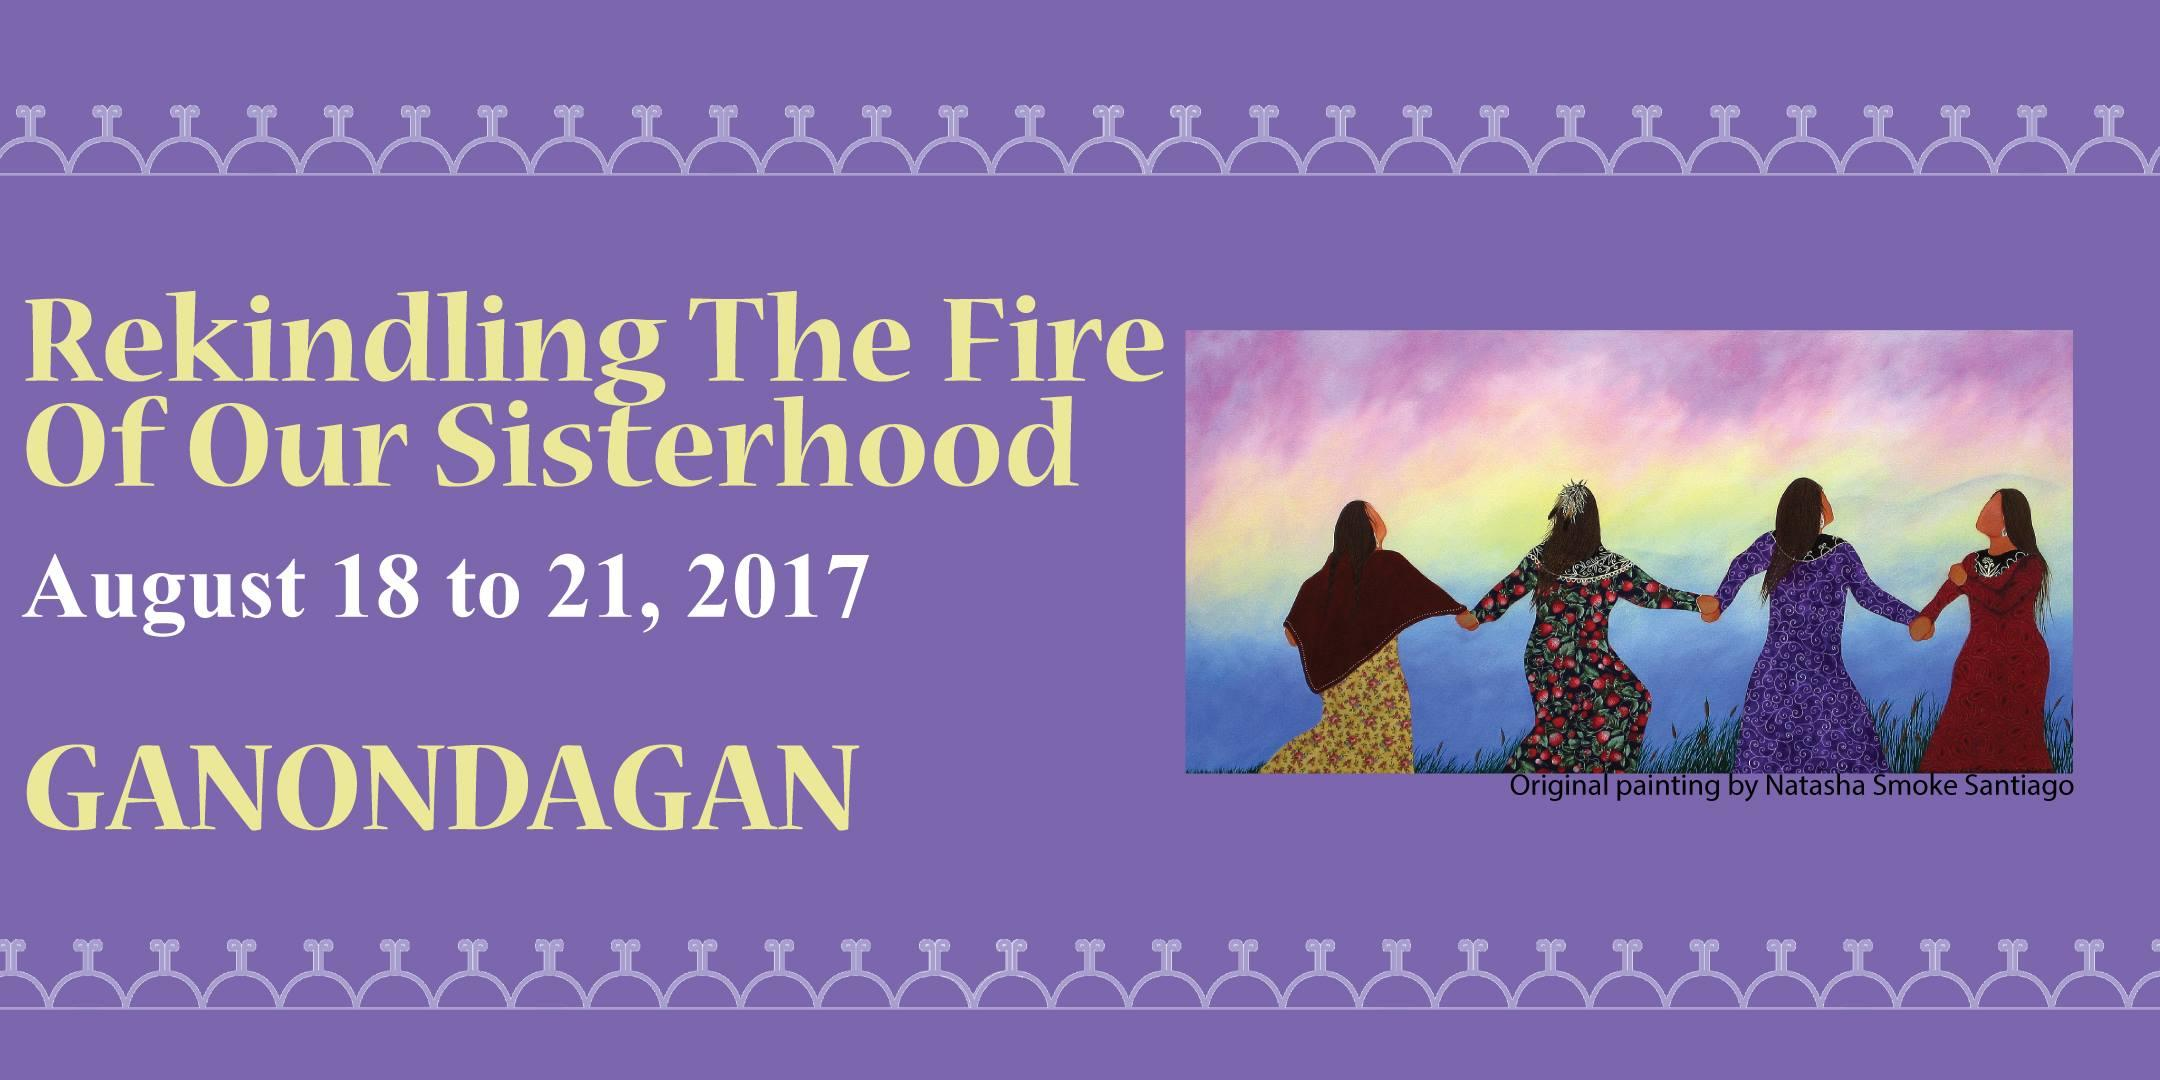 Rekindling the Fire of Our Sisterhood